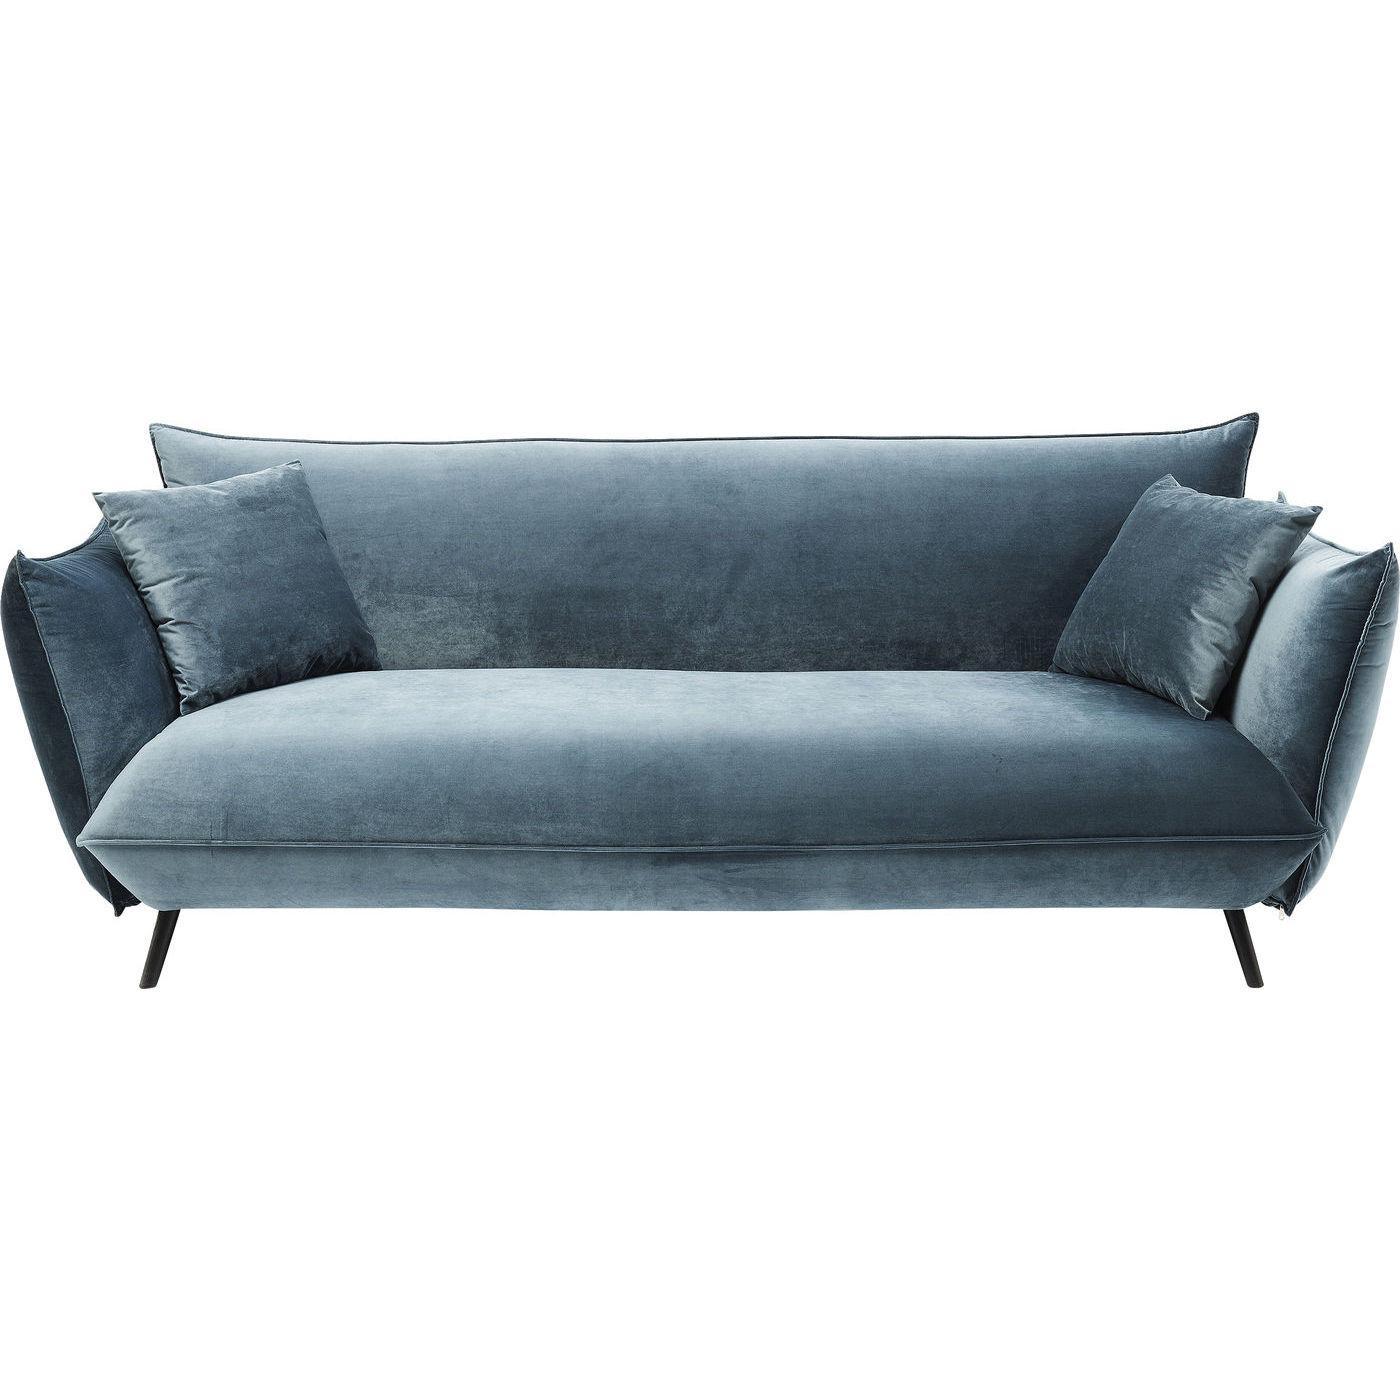 Image of   KARE DESIGN Molly Ocean 3-personers sofa - blåt stof, m. armlæn